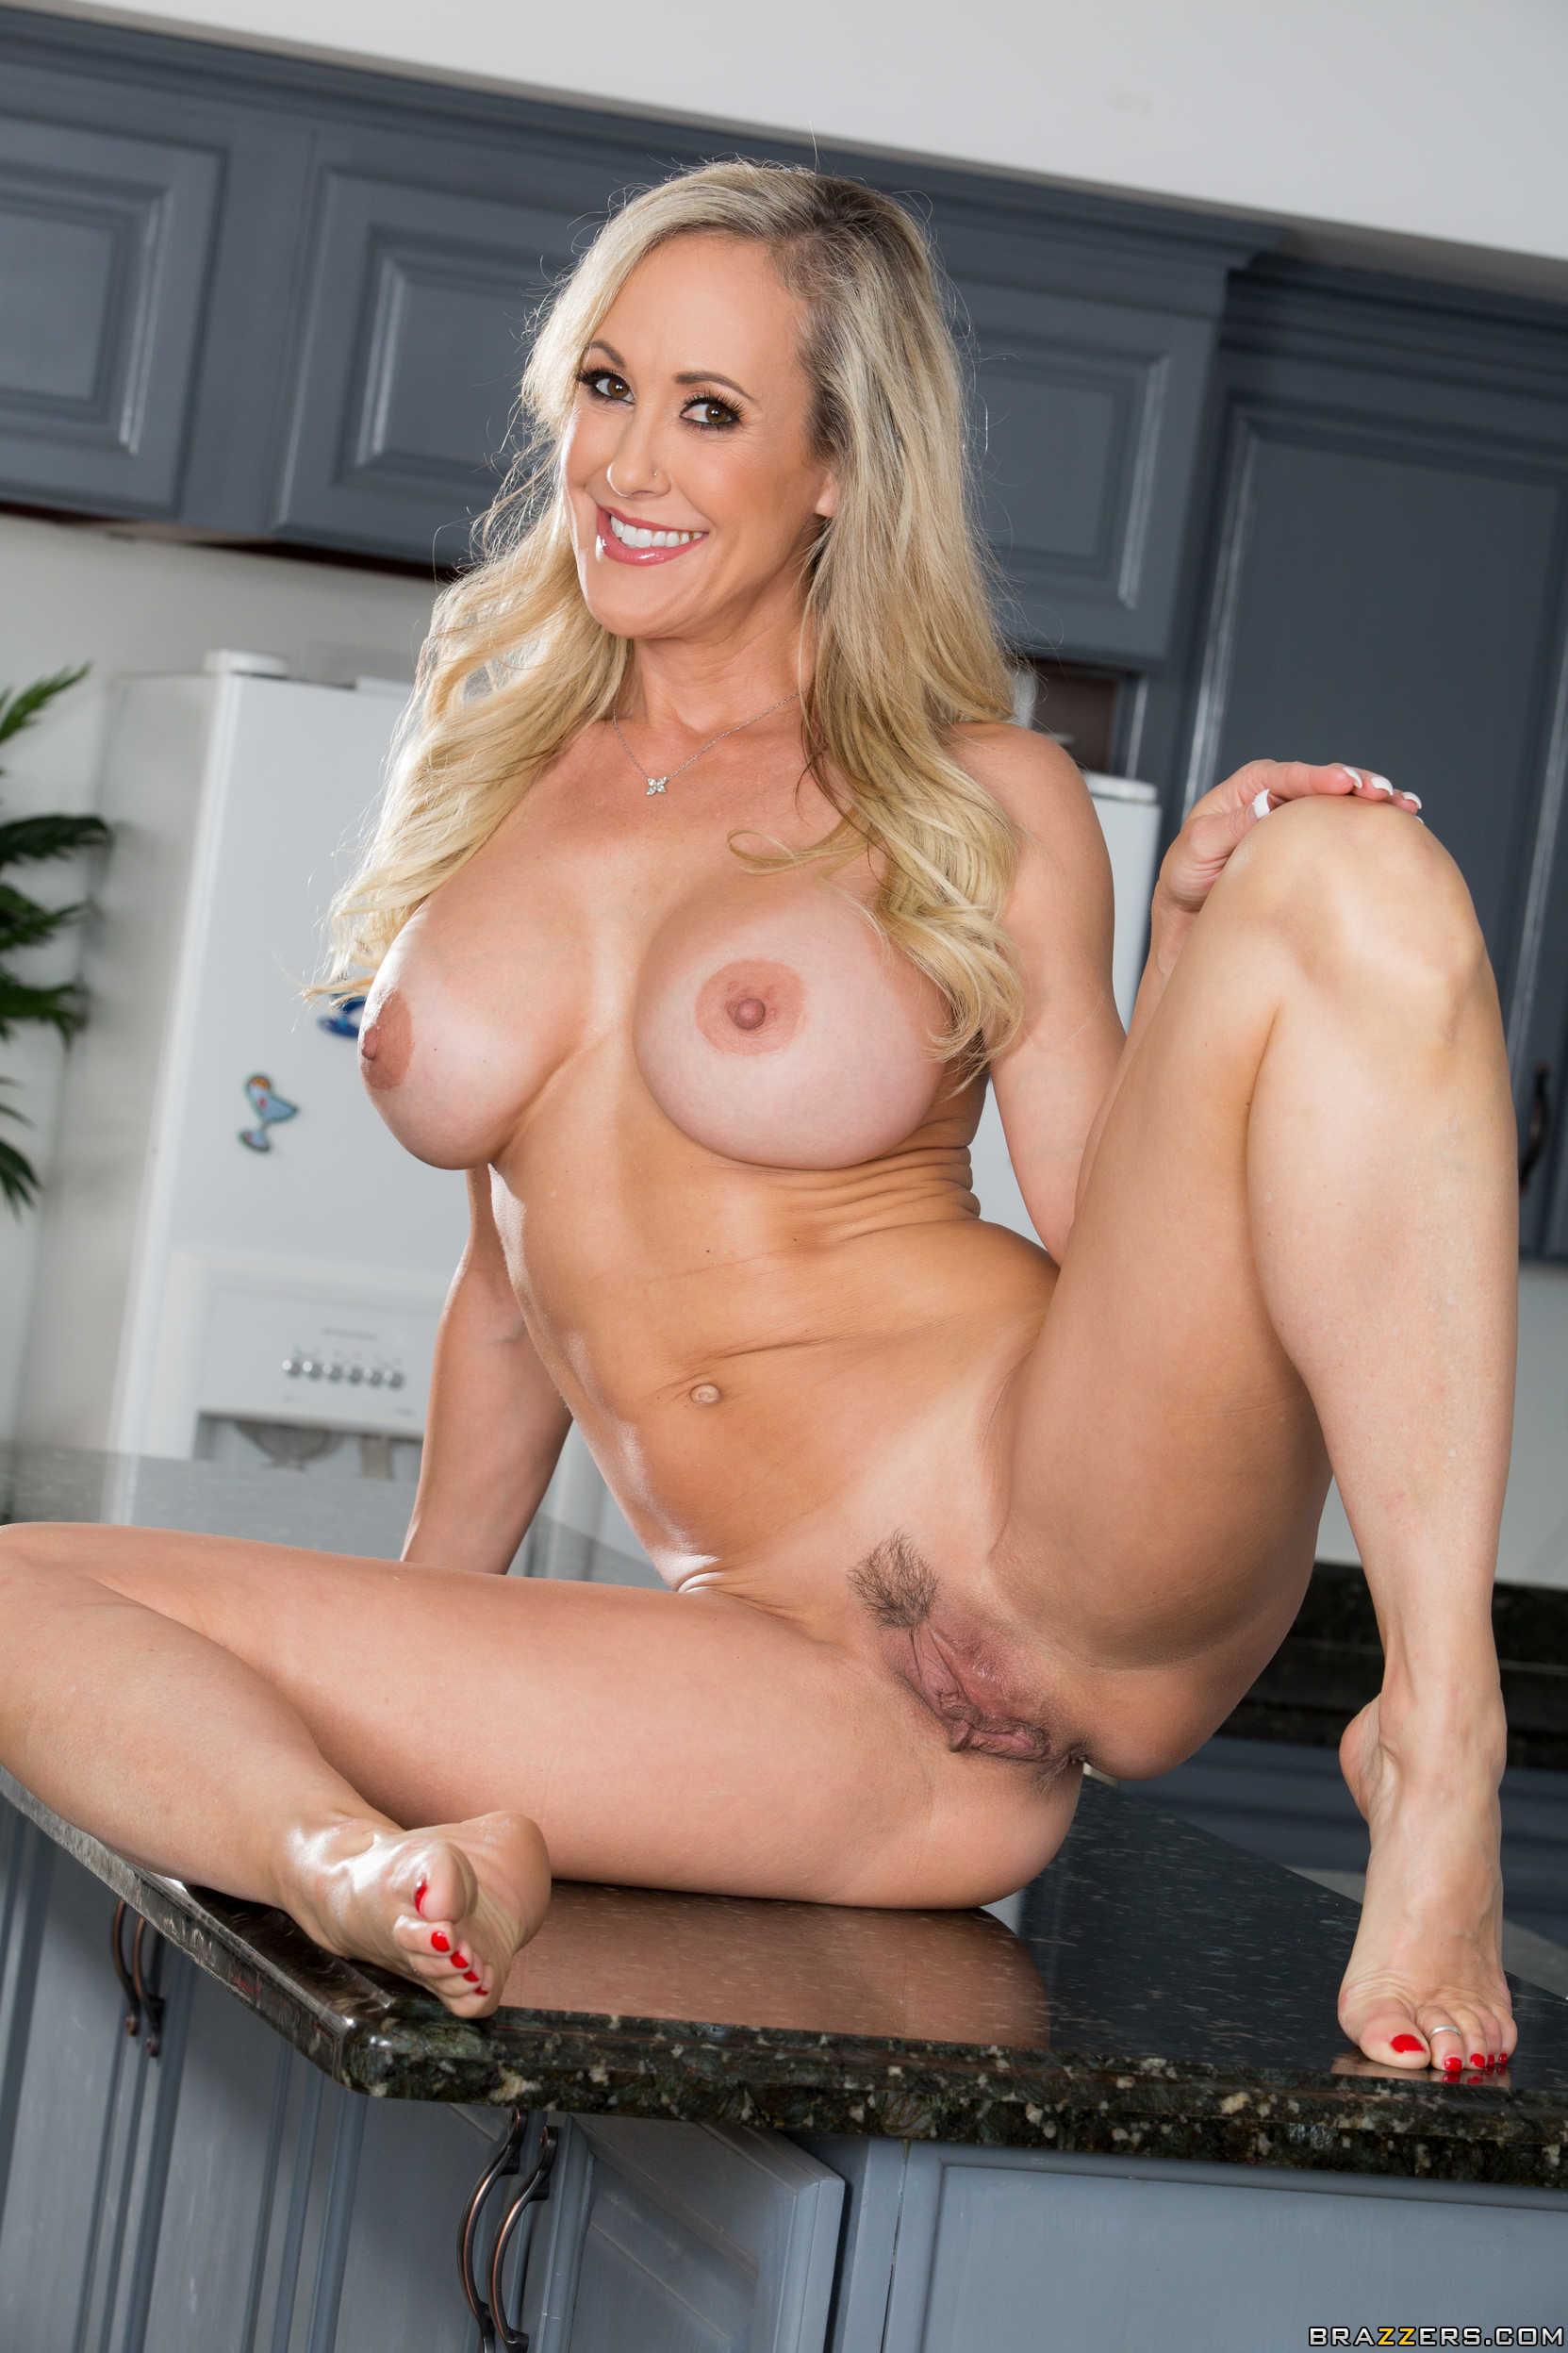 Great looking, blonde milf, brandi love spread her legs wide to get her pussy licked